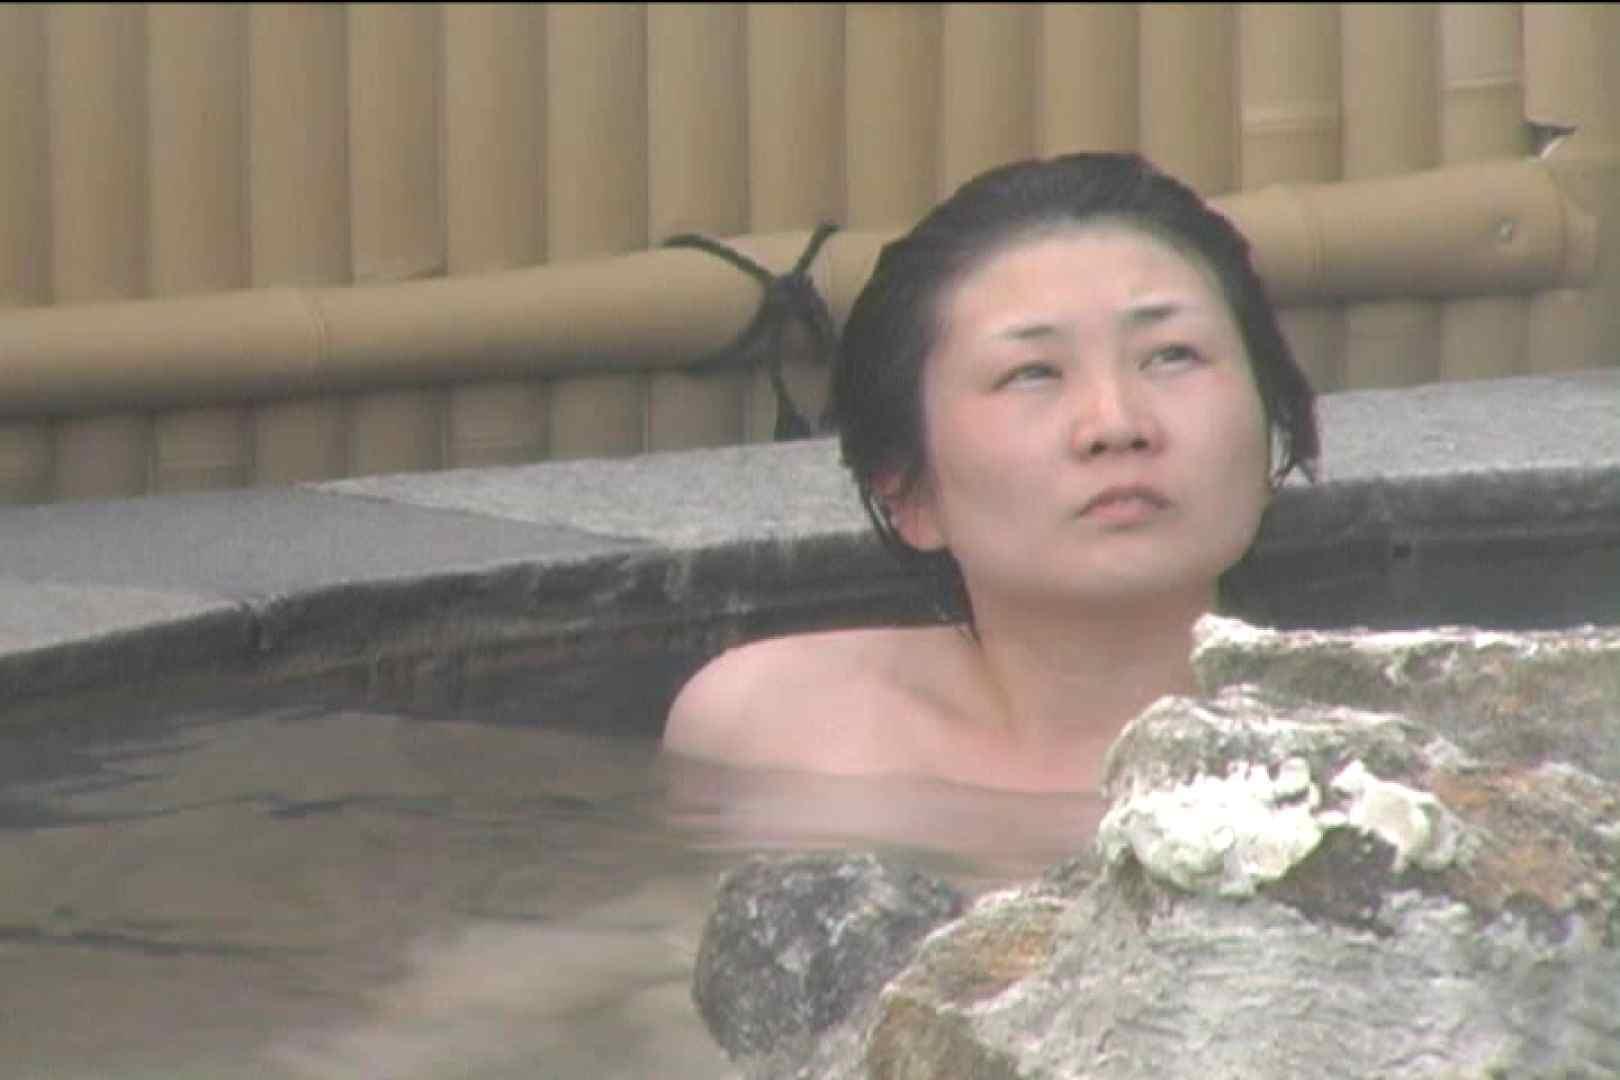 Aquaな露天風呂Vol.531 盗撮大放出 戯れ無修正画像 90連発 53